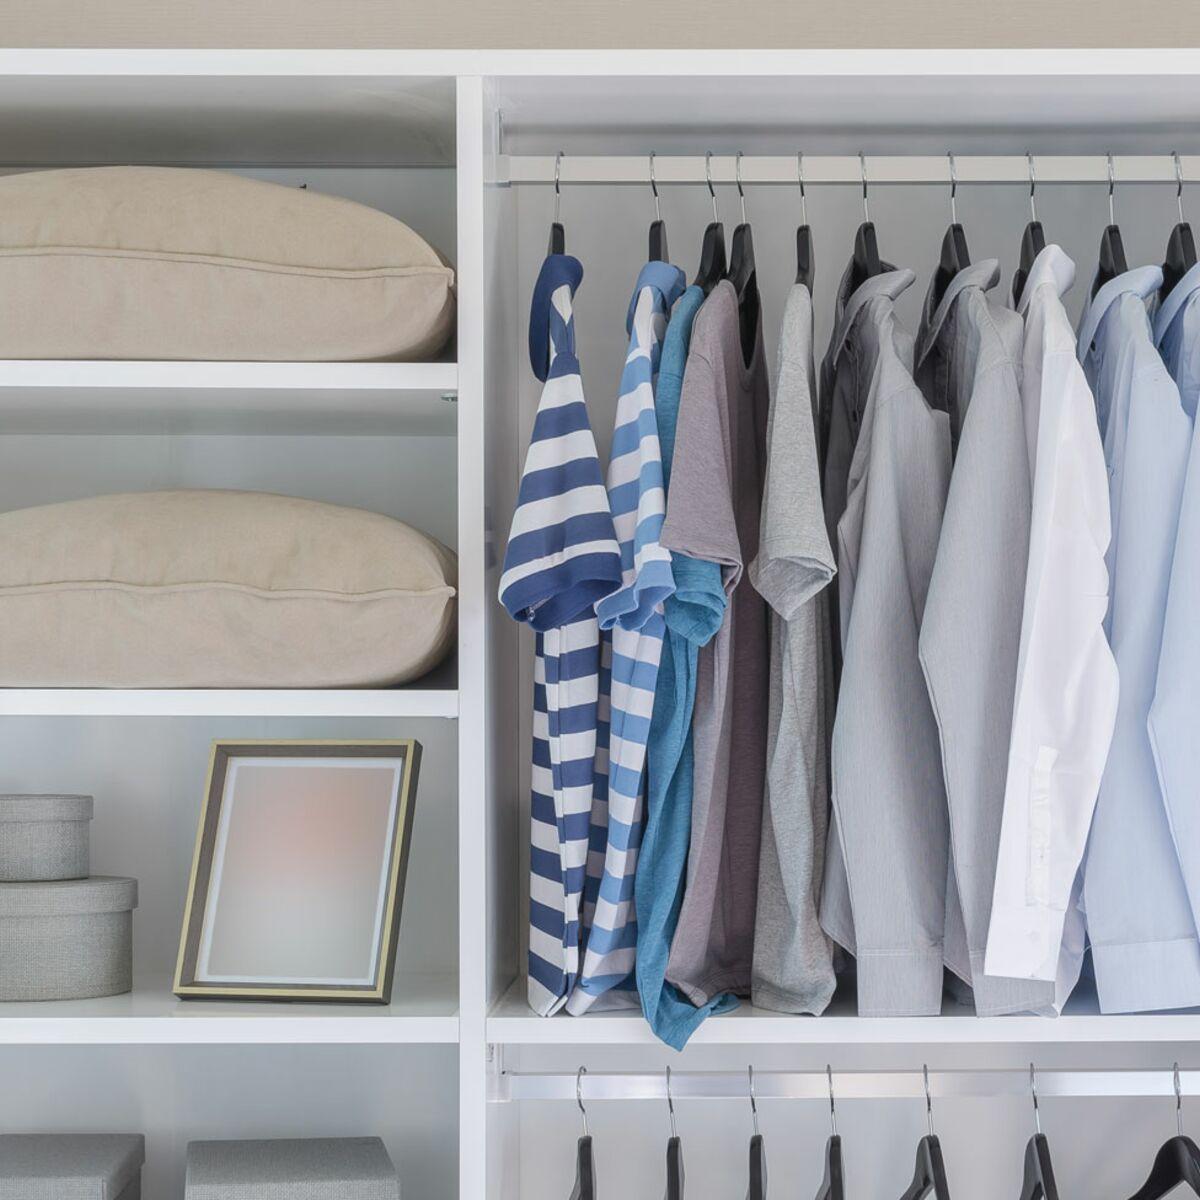 Dressing Ikea Pas Cher dressing pas cher : nos astuces pour économiser : femme